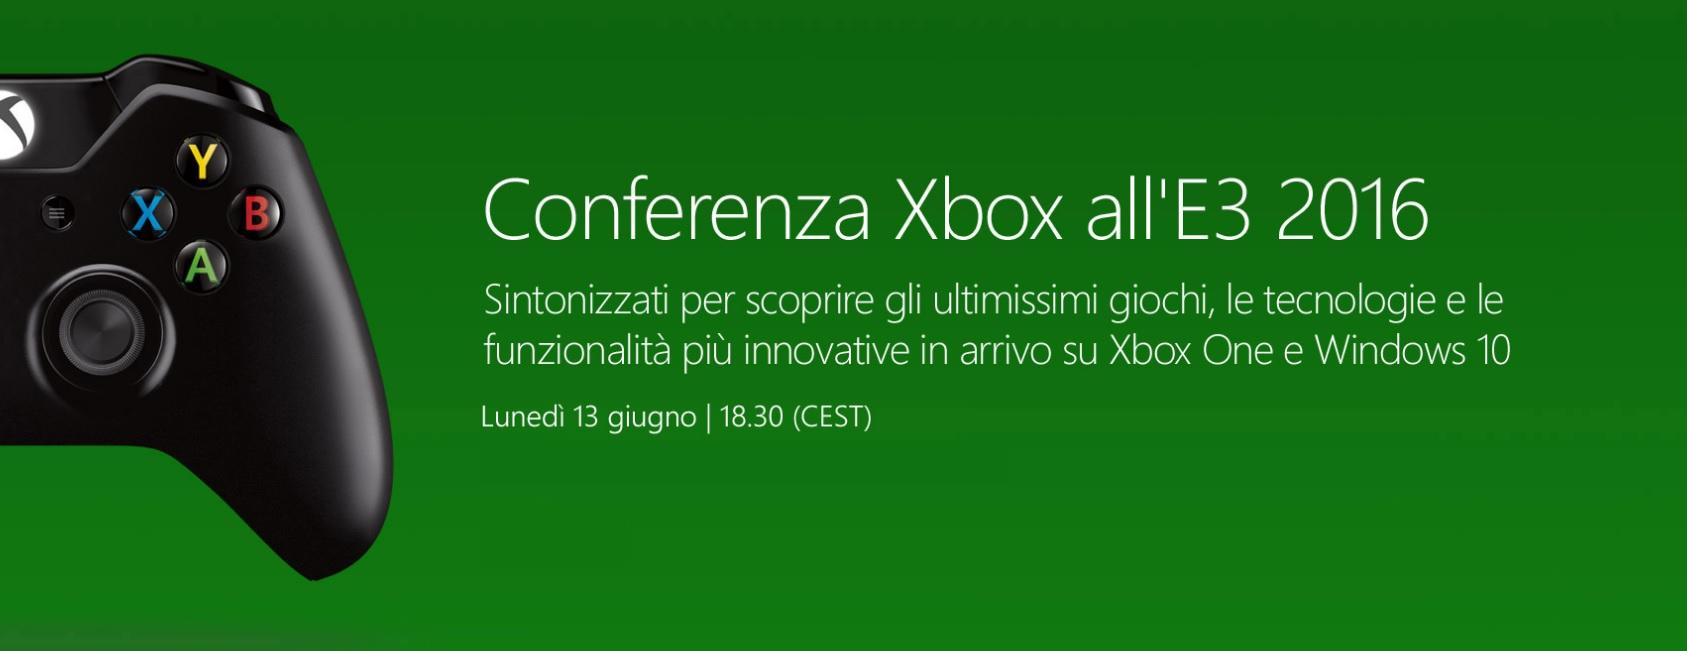 xbox-e3-2016-live-streaming